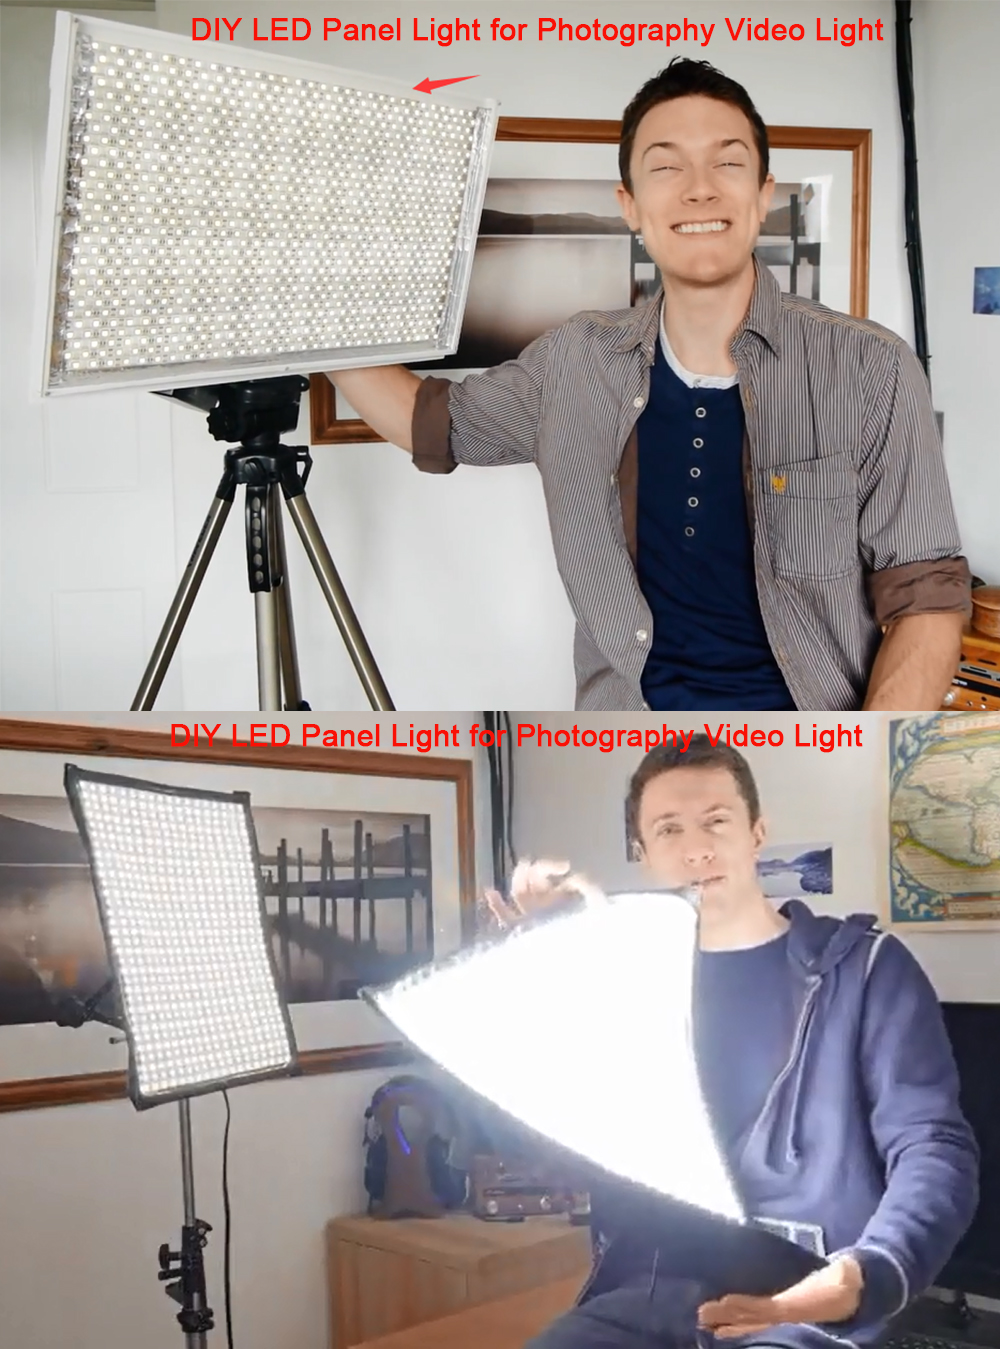 MARSWALLED גבוהה CRI RA 90 +/95 +/97 + LED רצועת אור SMD5630 אור יום לבן 5600K עבור מצלמה צילום DIY LED פנל אור